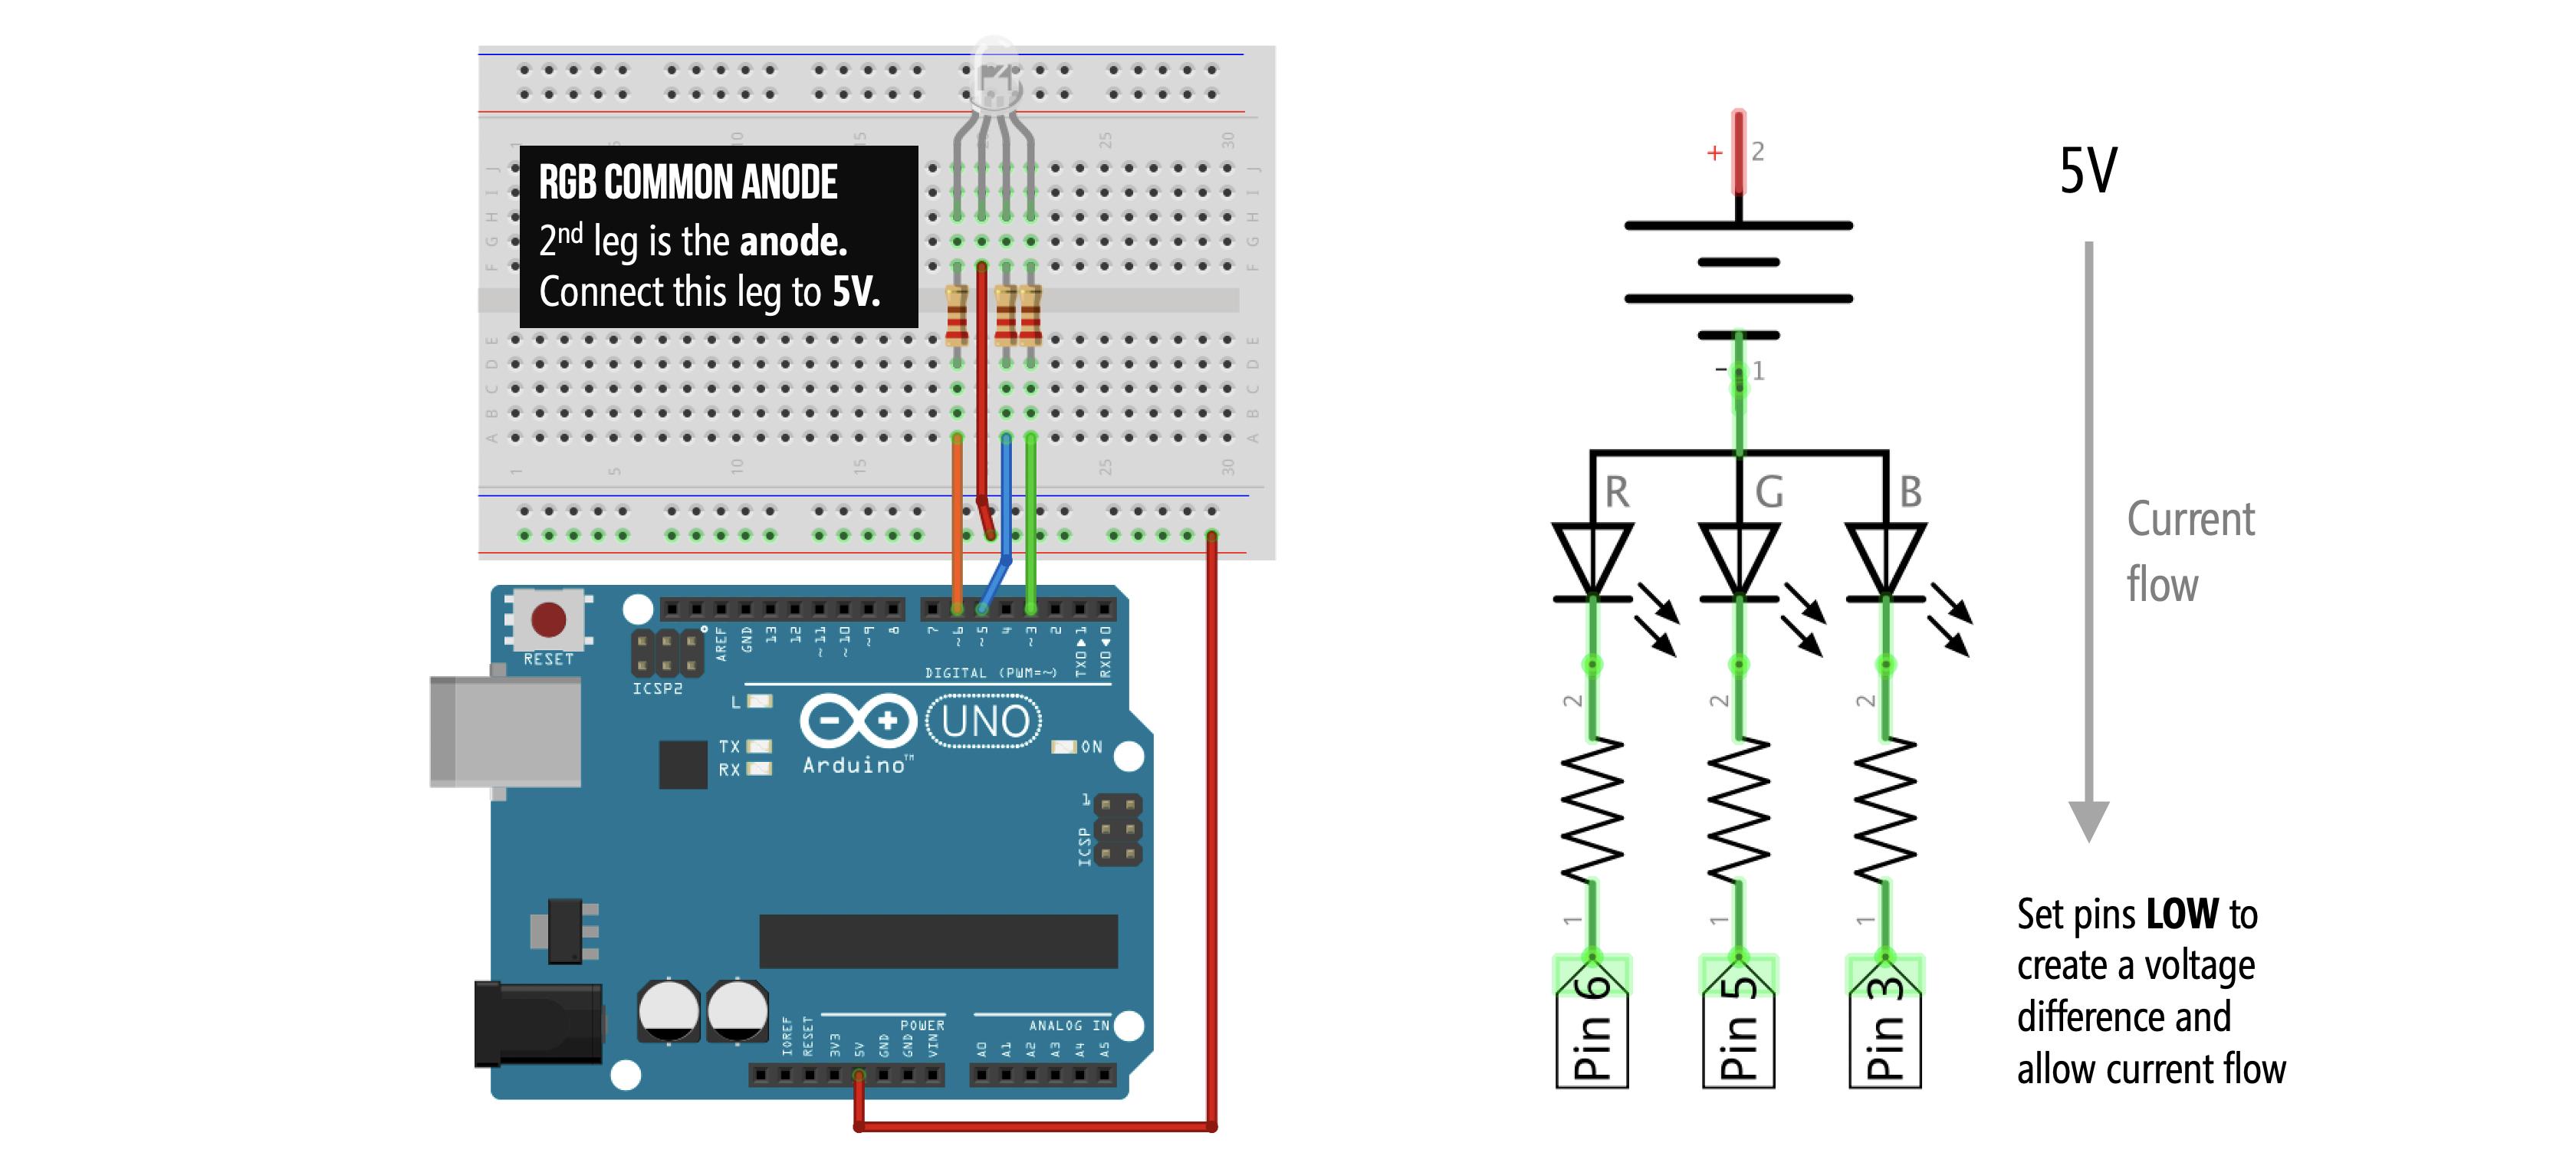 Rgb Led Wiring Diagram from makeabilitylab.github.io